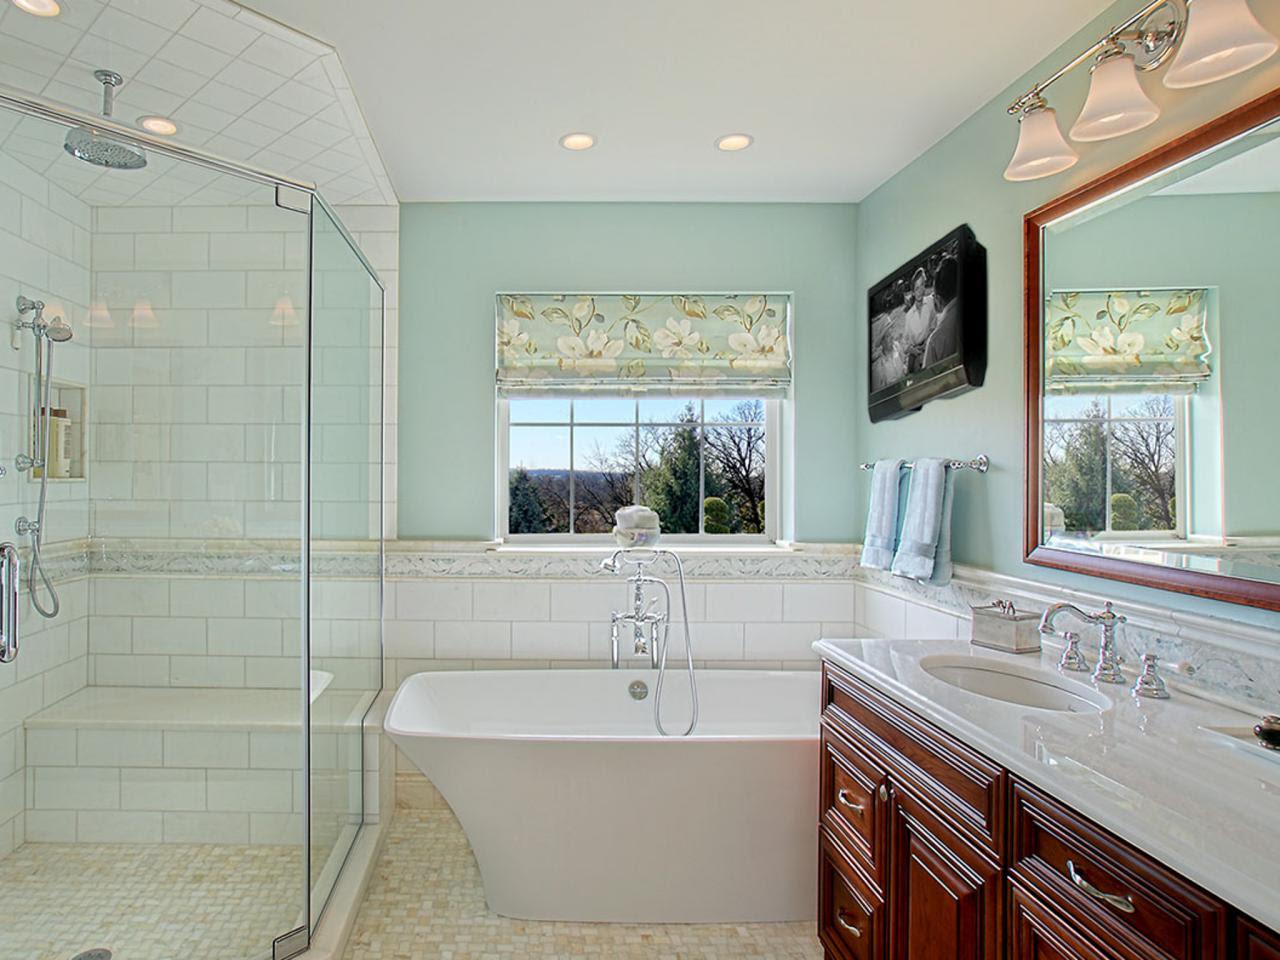 Master Bathroom Makeover With Luxurious Tub | Joan Suzio ...